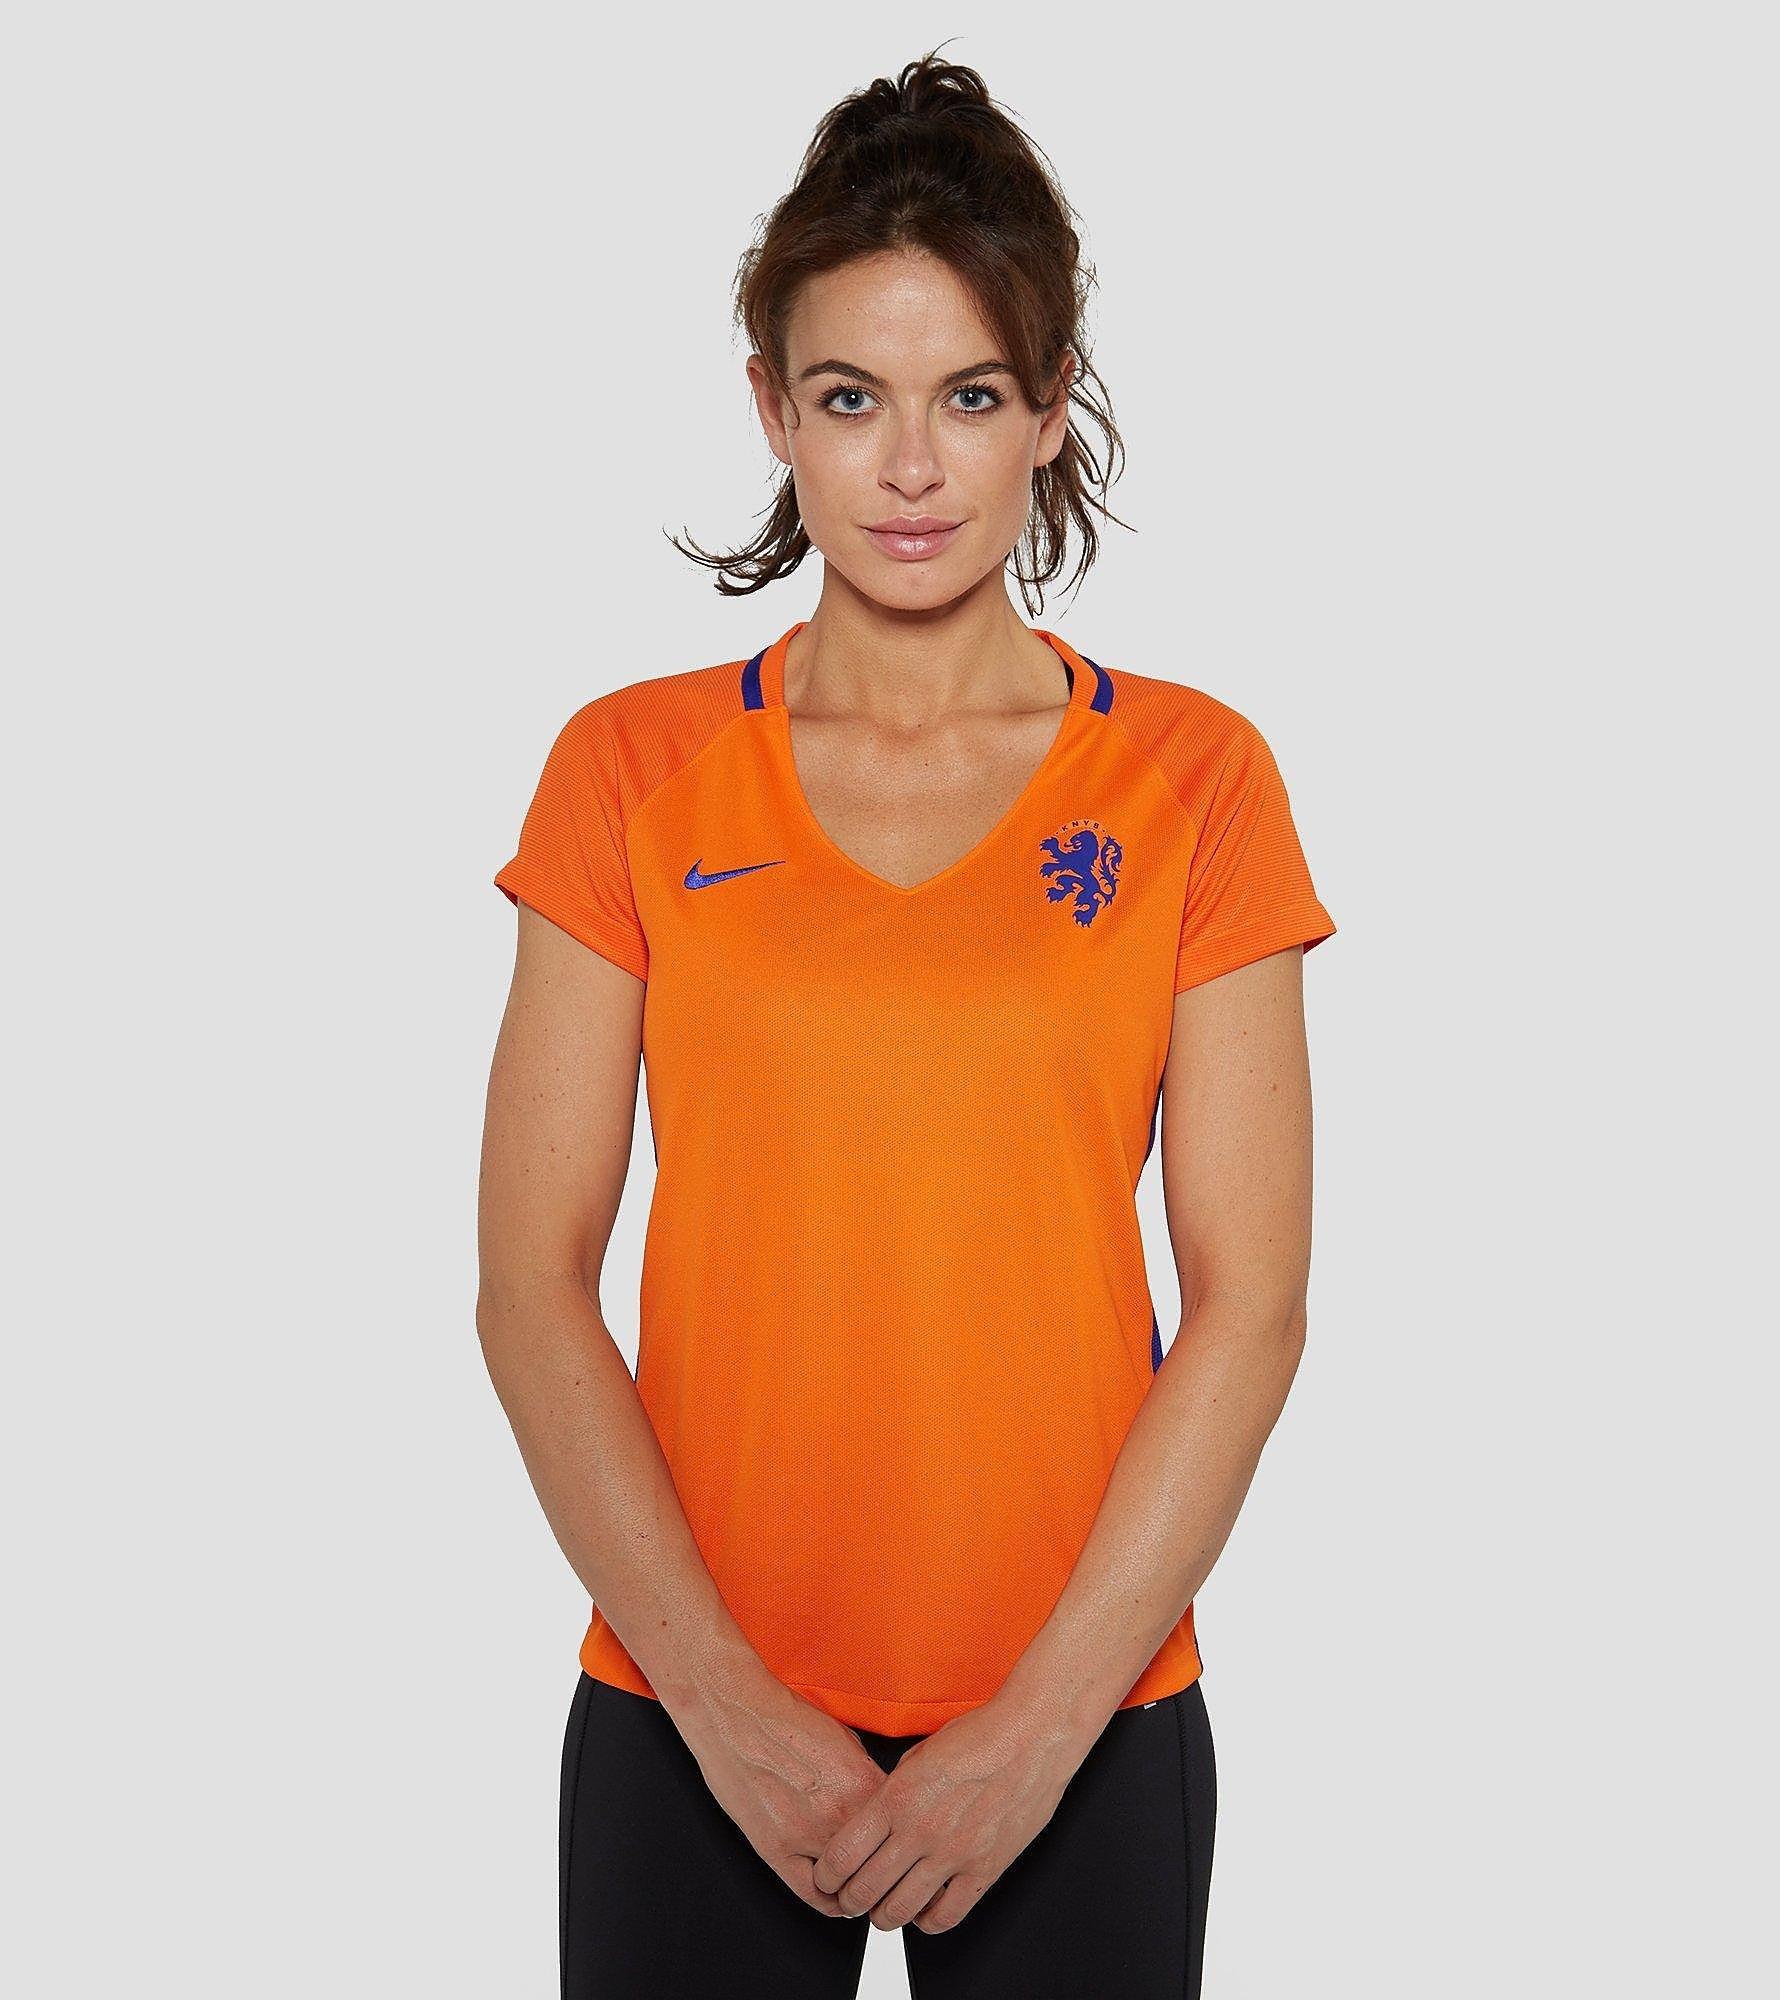 Nike NEDERLAND THUISSHIRT DAMES